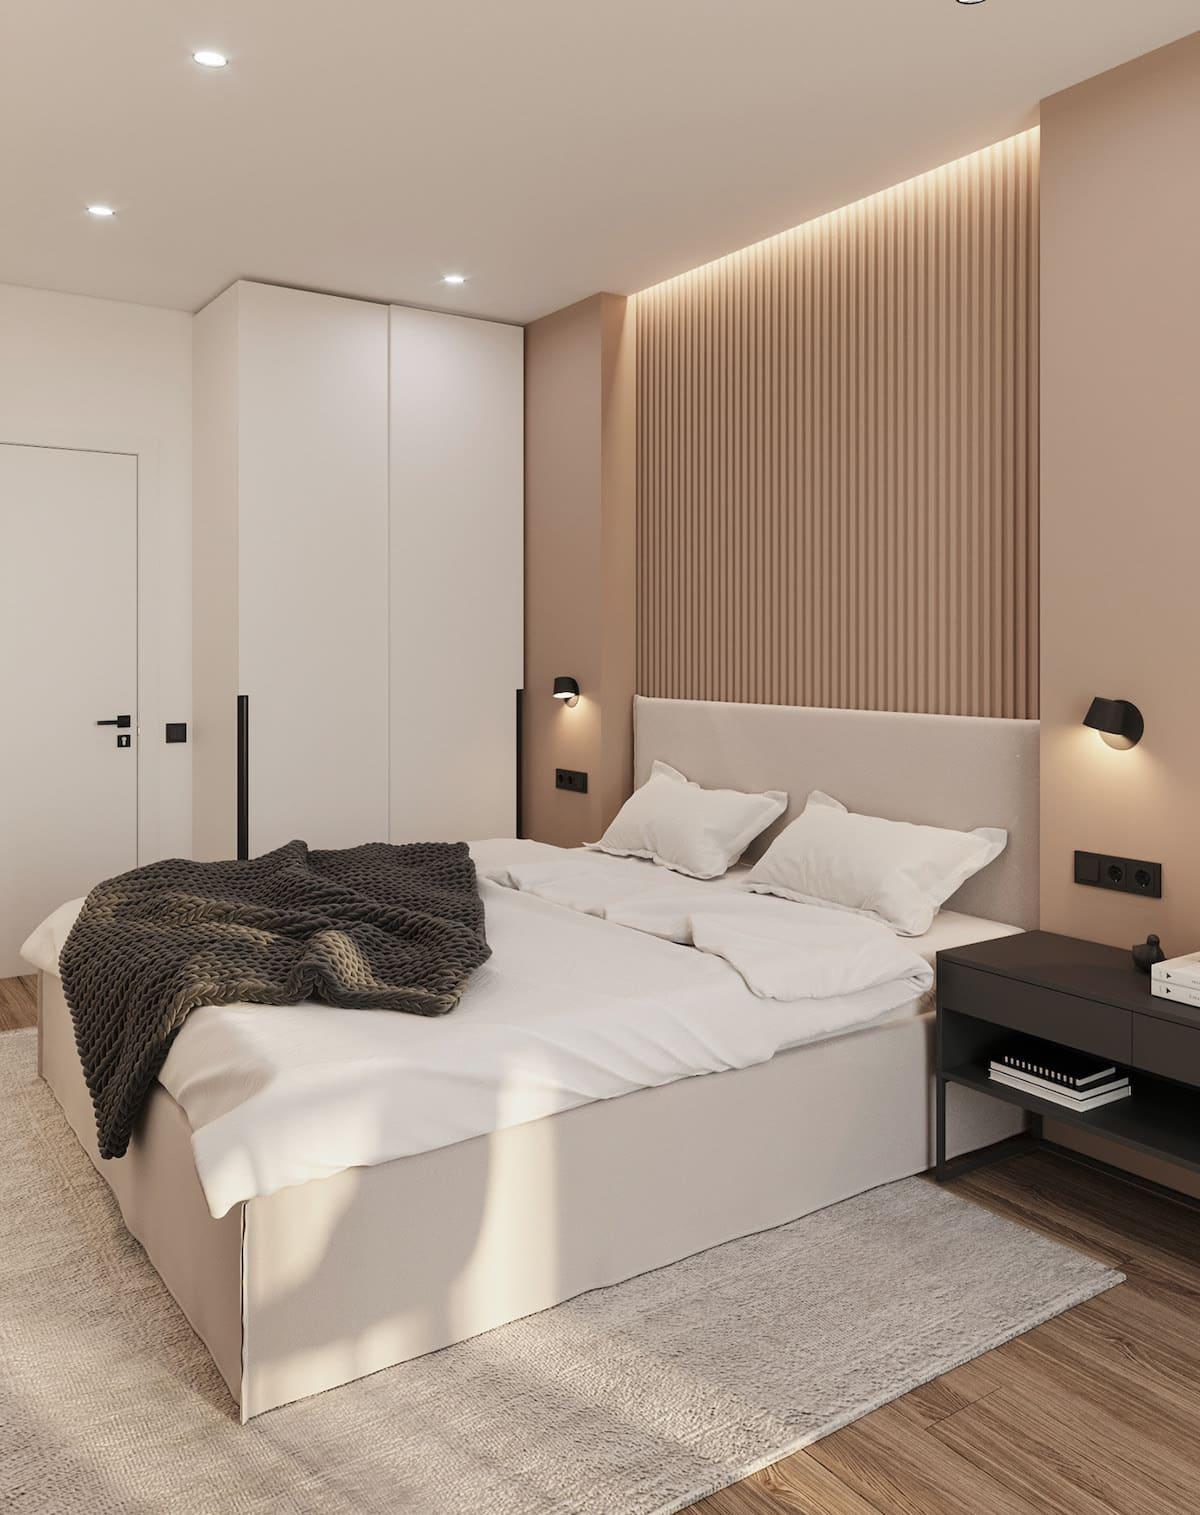 модный дизайн интерьера квартиры фото 103